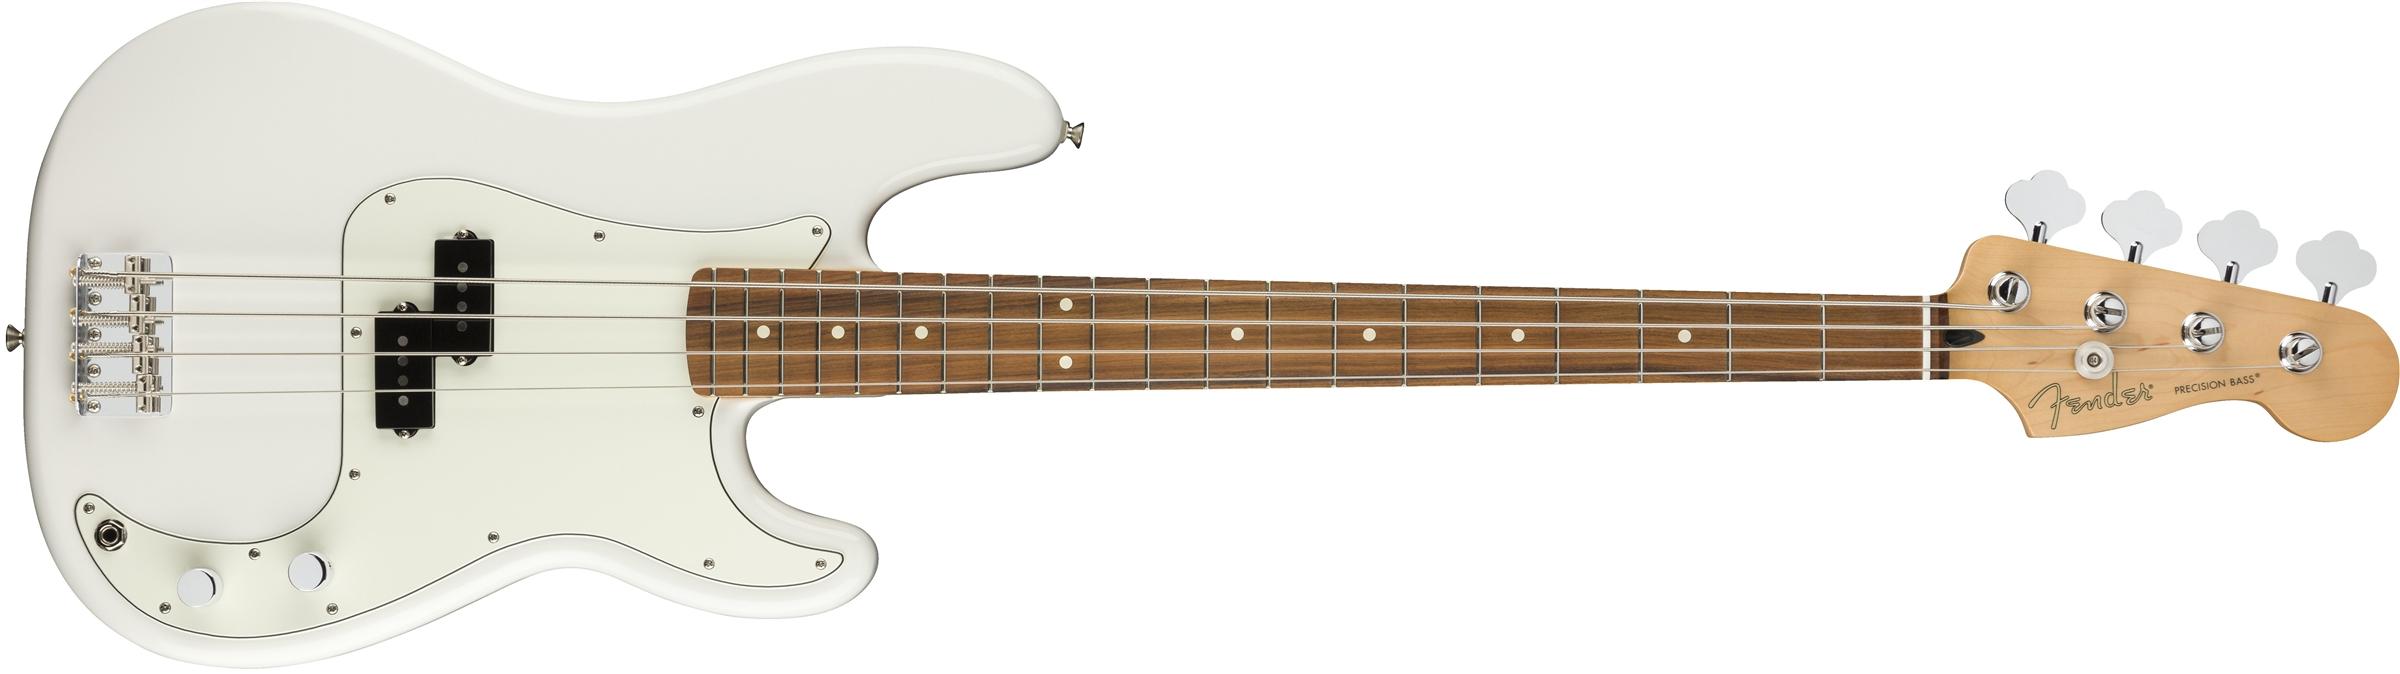 FENDER-Player-Precision-Bass-PF-Polar-White-0149803515-sku-24217